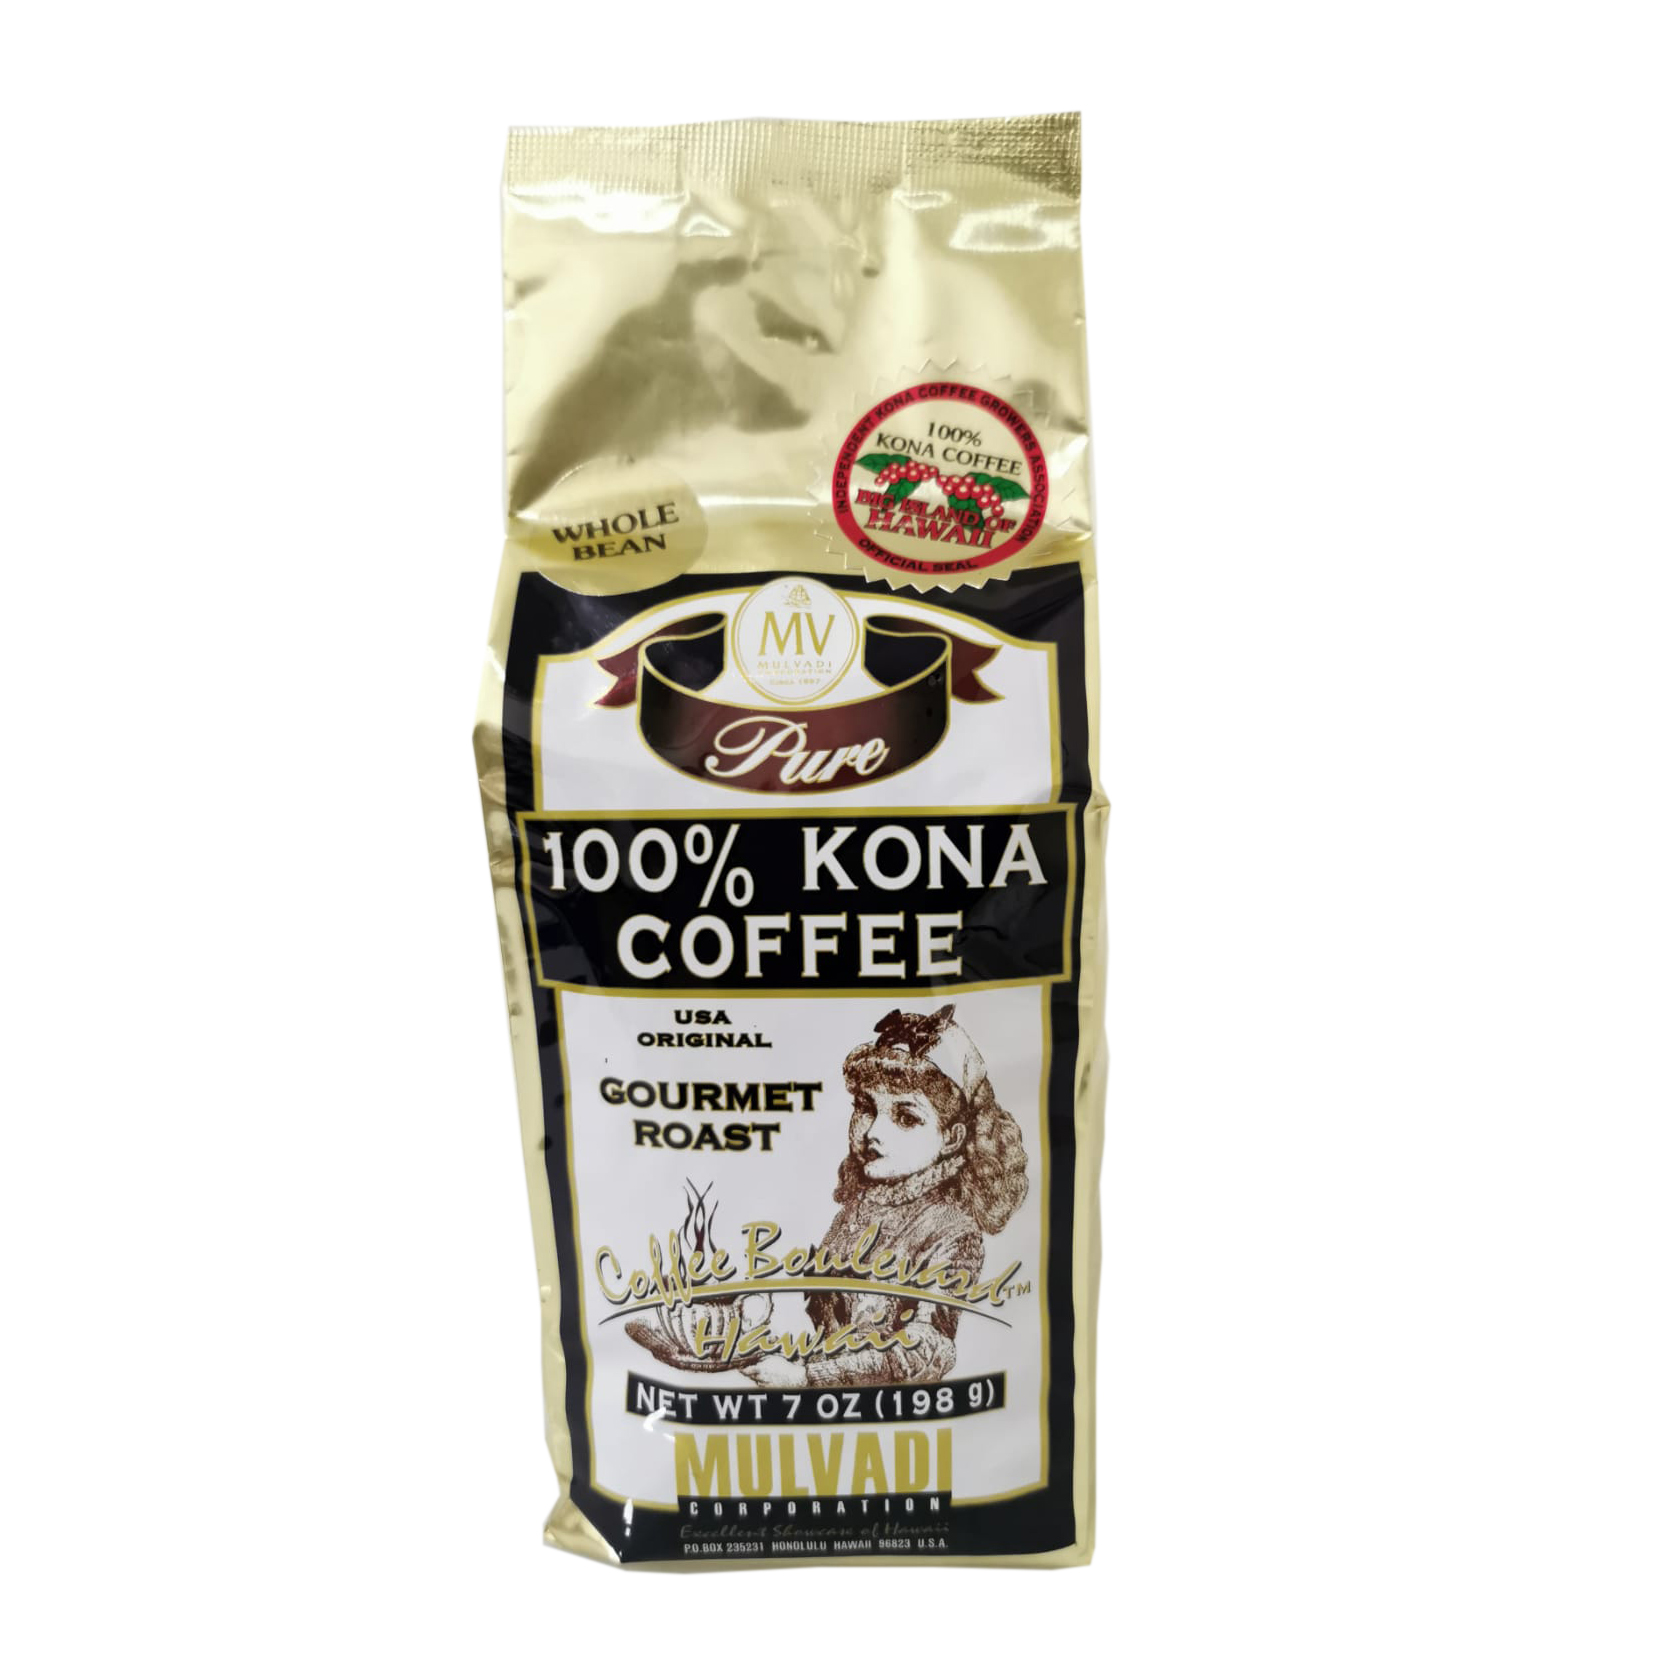 Mulvadi 100% Kona Coffee (7oz/198g)